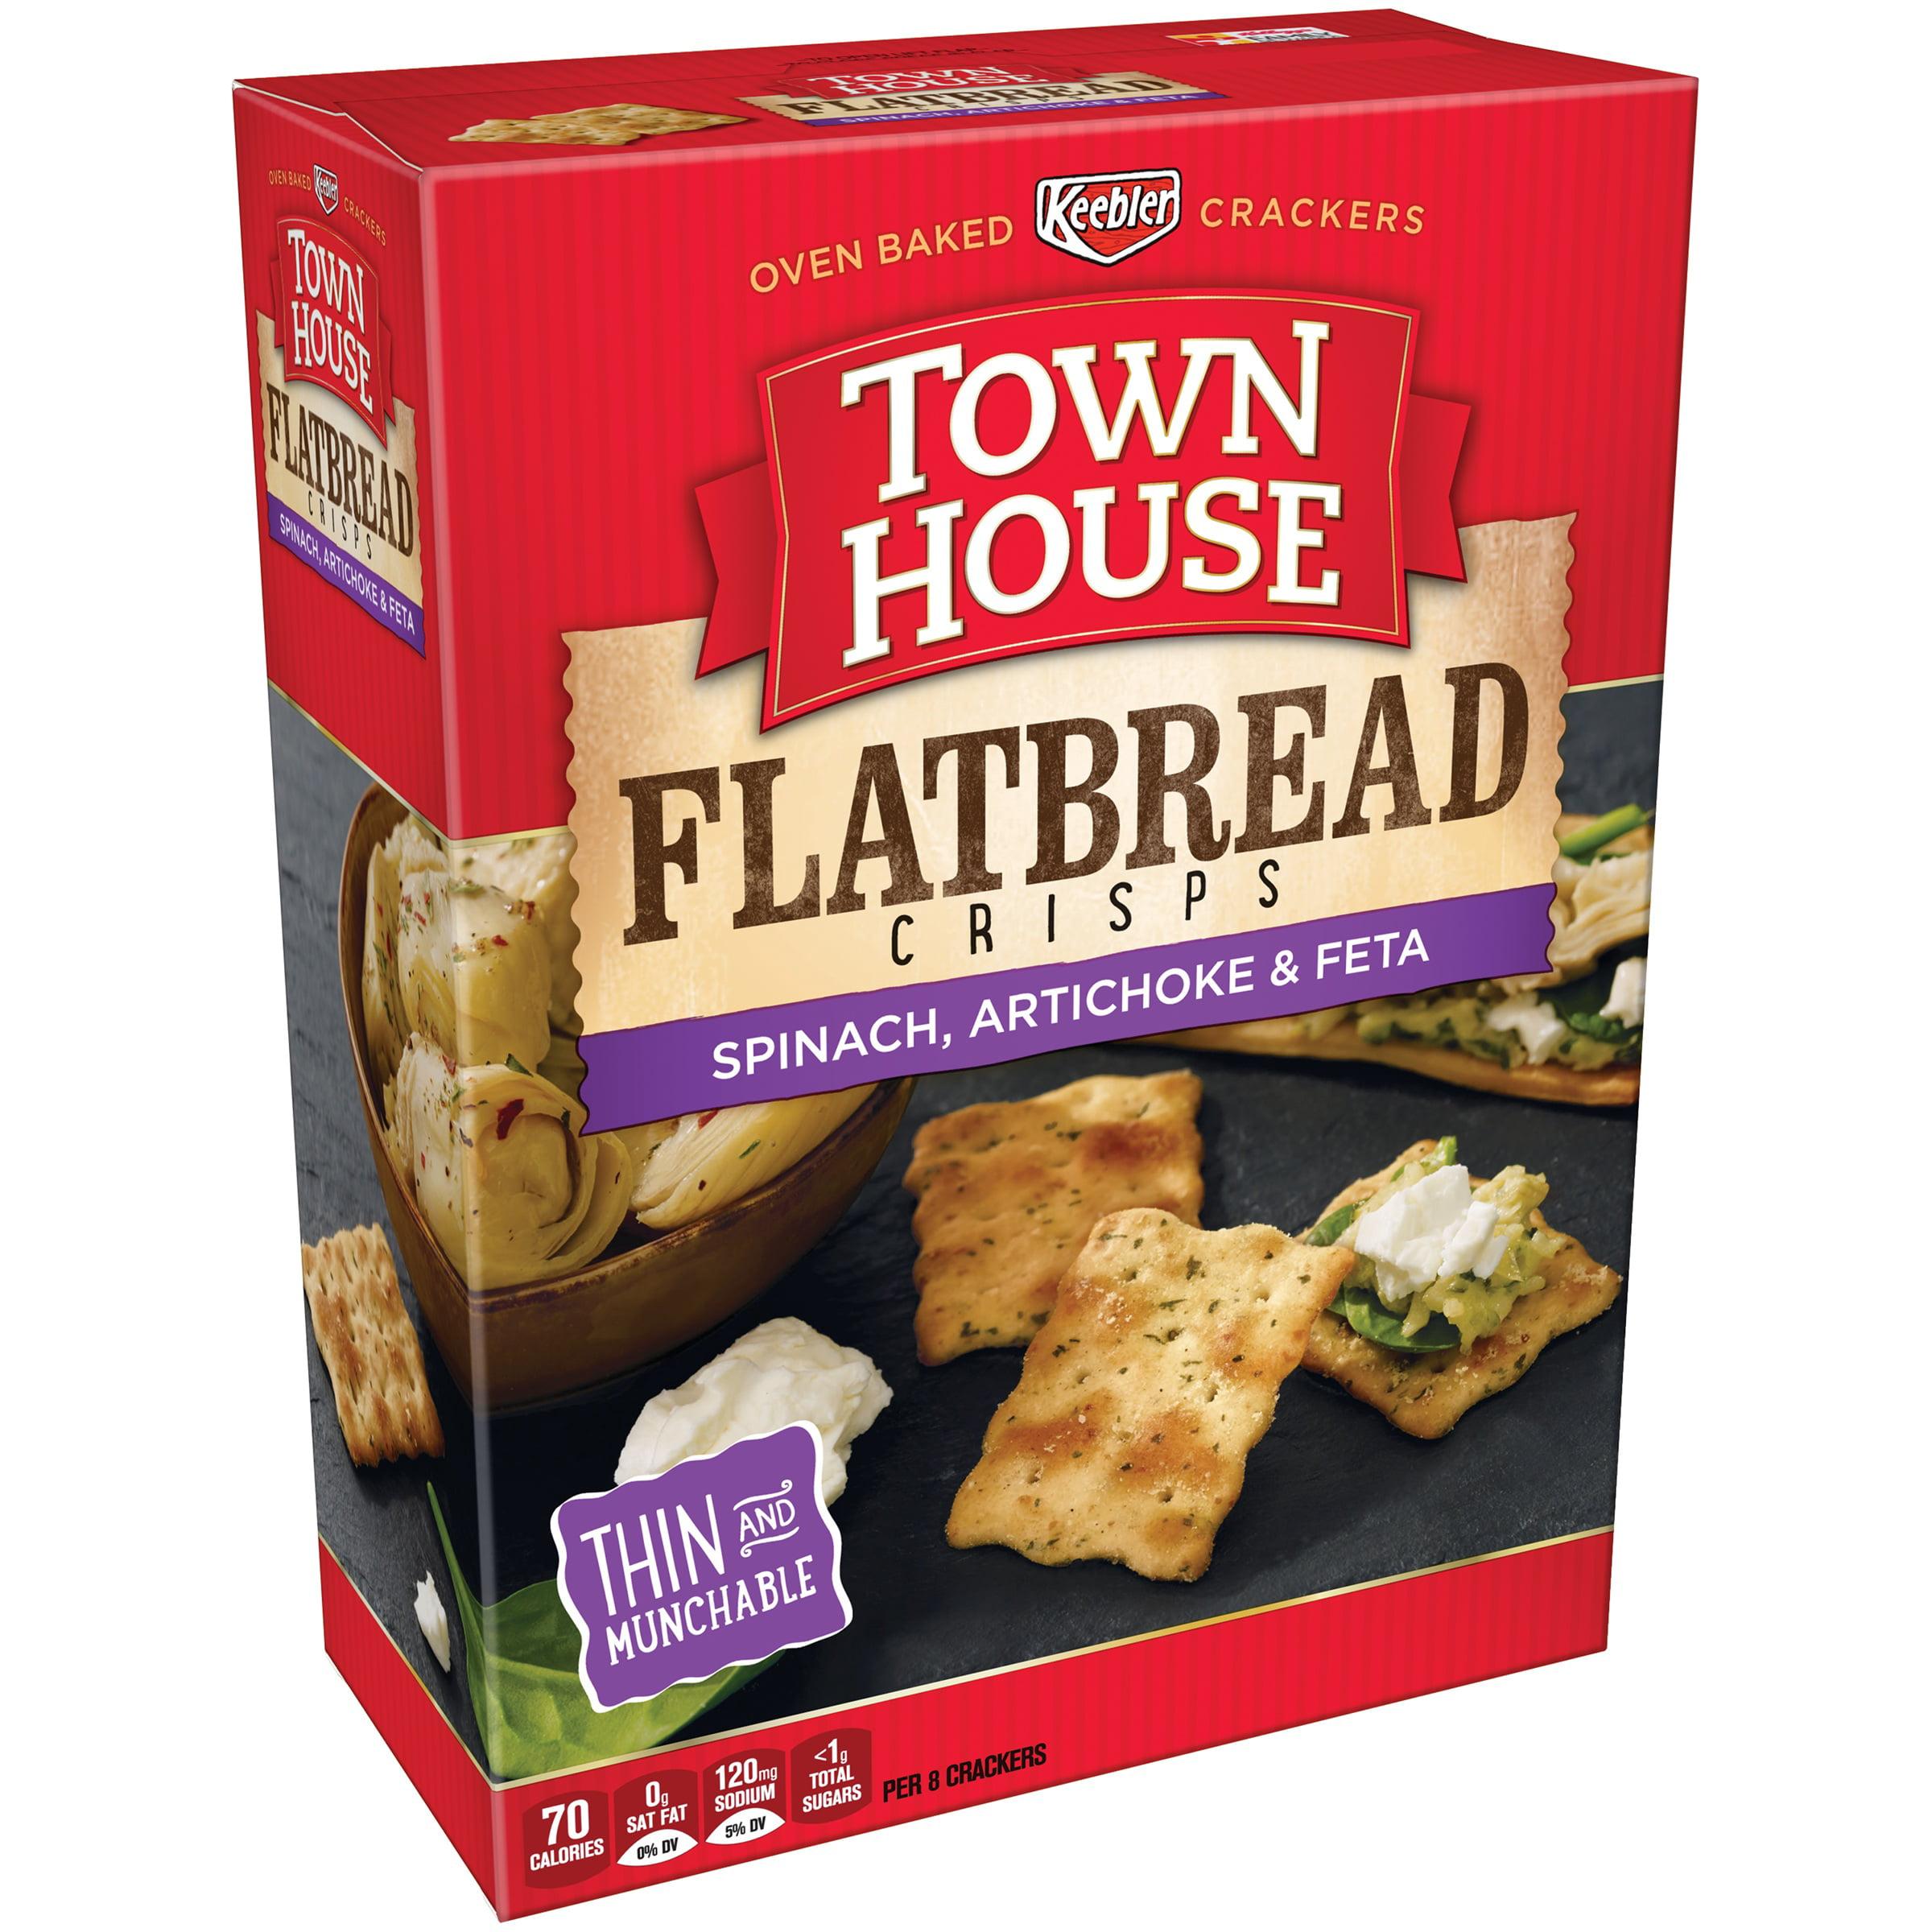 Town House Spinach, Artichoke & Feta Flatbread Crisps 9.5 oz. Box by Kellogg Sales Co.